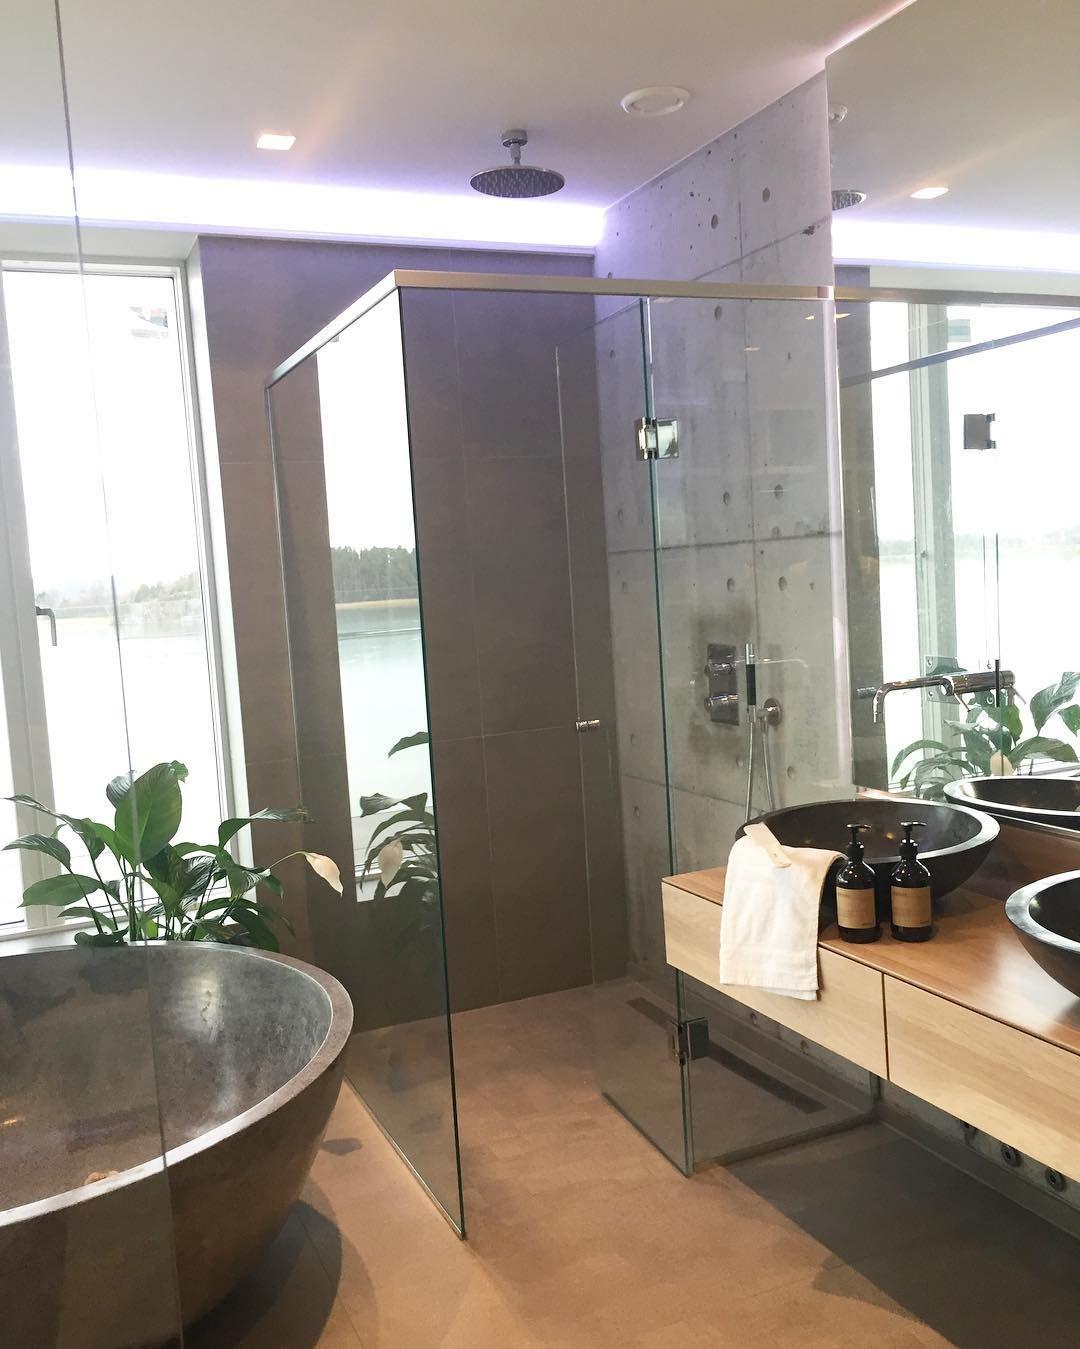 sarpsborg norway scandinavia my home interior design endearing design my bathroom free decorating design - Design My Bathroom Free